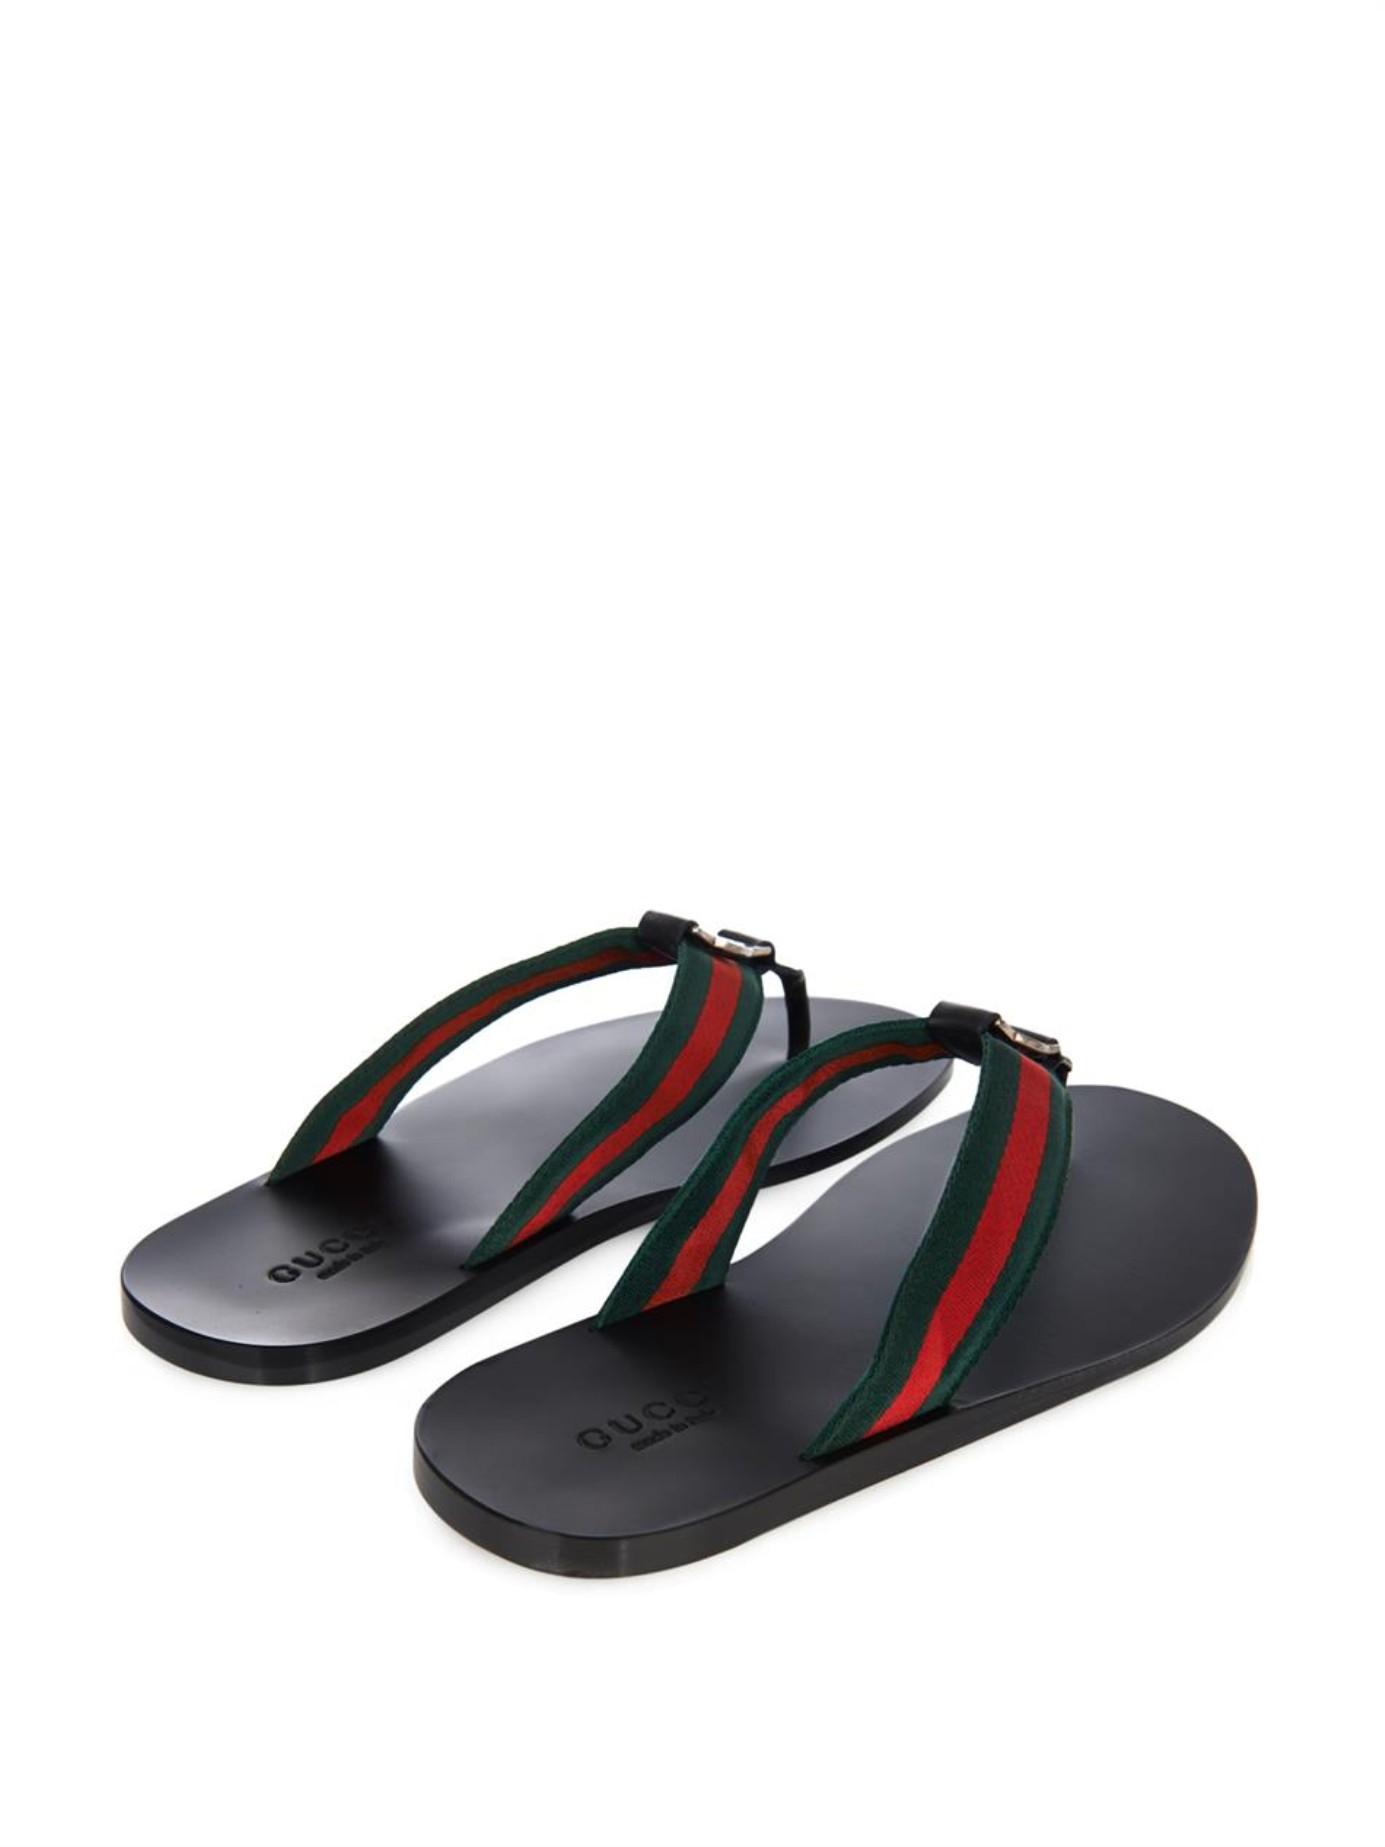 97f7ad02d42f4d Lyst - Gucci Web Thong Flip-Flops in Black for Men